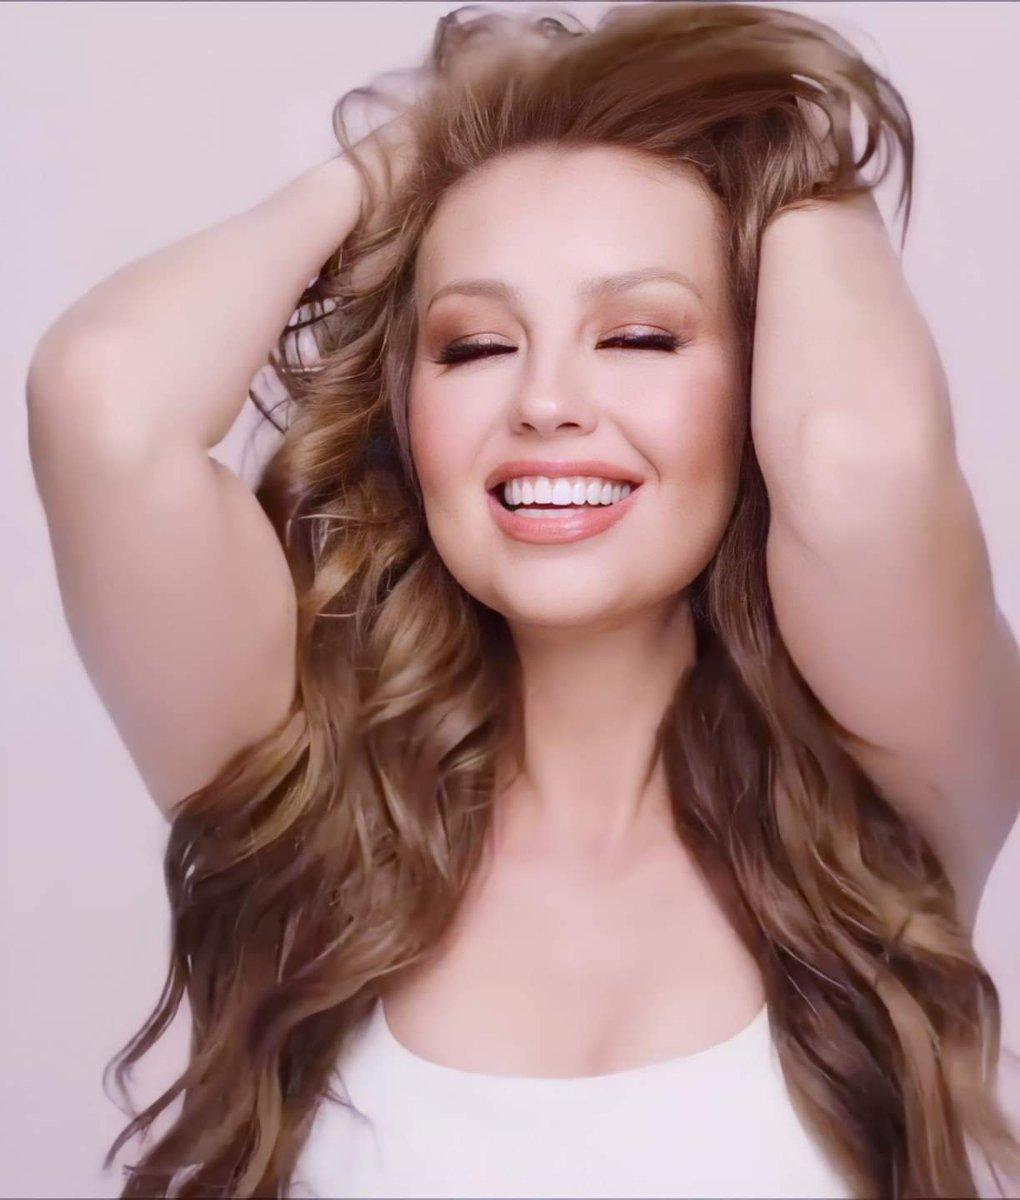 @thalia #love #thalia #thalía #thaliachallenge #ticktock #laluz #tencuidao #yatumeconoces #lifestyle #likeforlikes #like4likes #photography #photooftheday #photographer #makeup #tiktok #instagood #instagram #music  #thaliasodicollection #sodimiranda1803 #mdcthalia #model